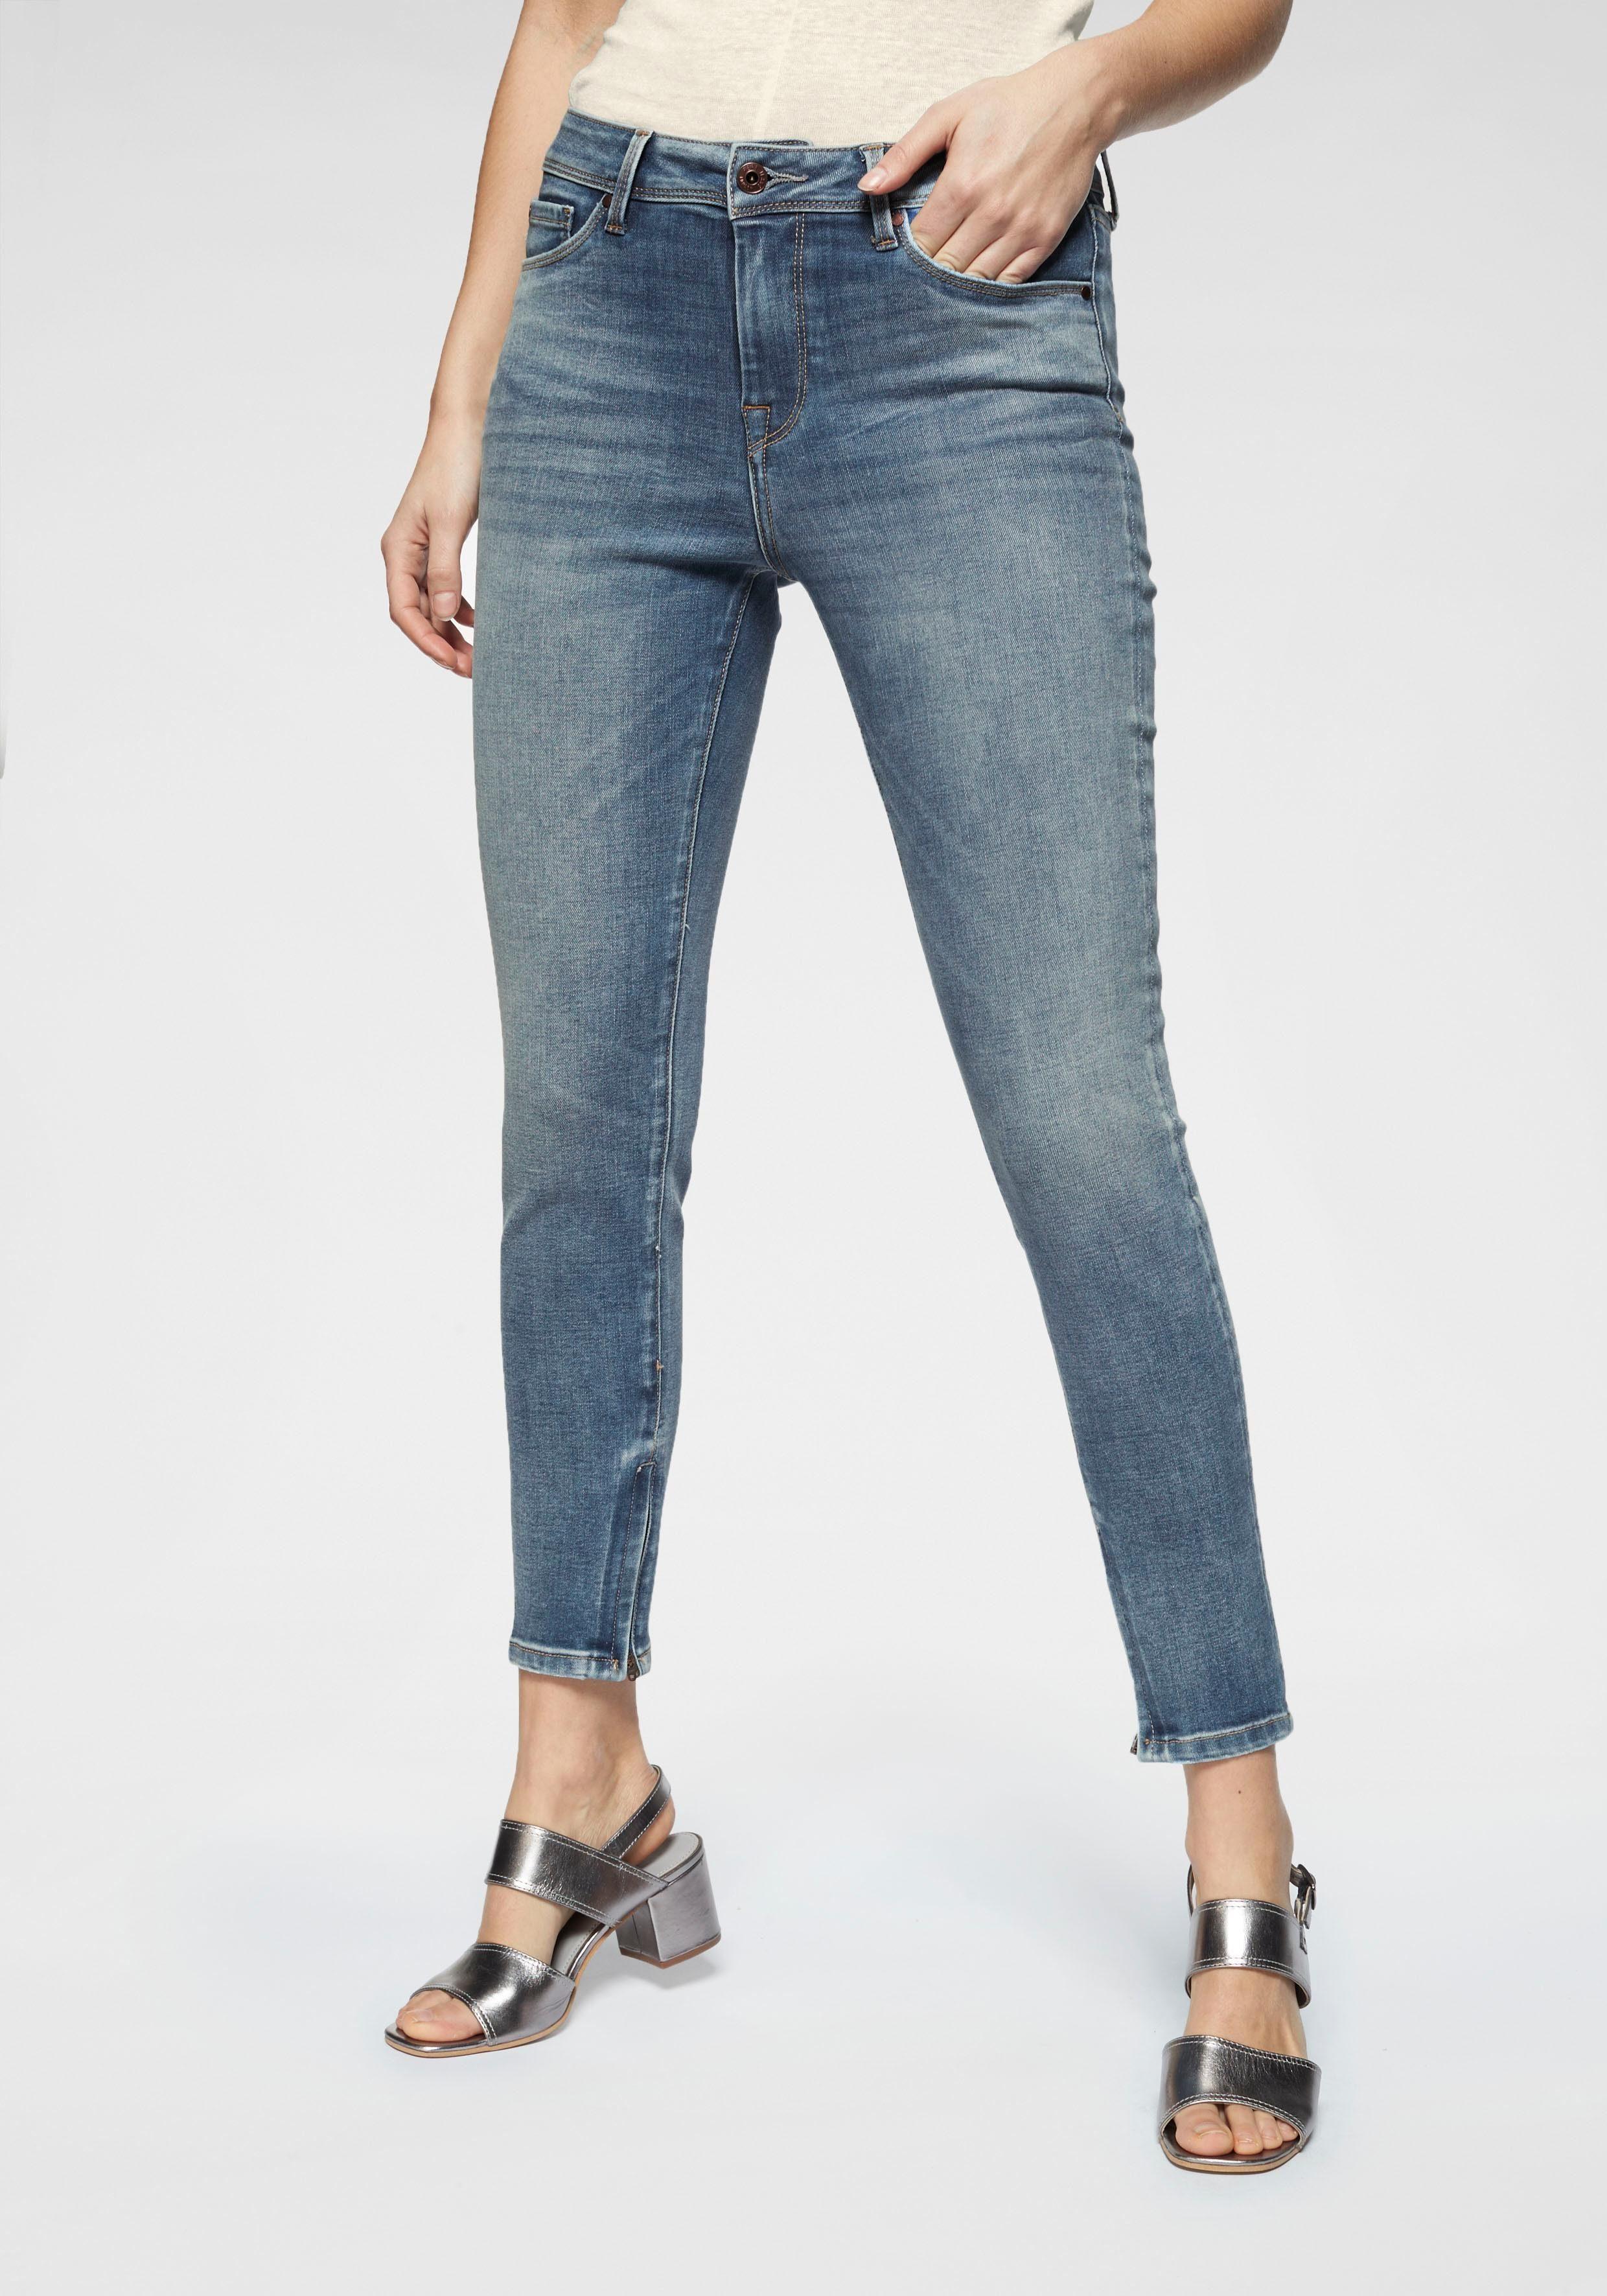 Pepe Jeans Skinny fit Jeans »CHER HIGH« im 5 Pocket Stil online kaufen | OTTO